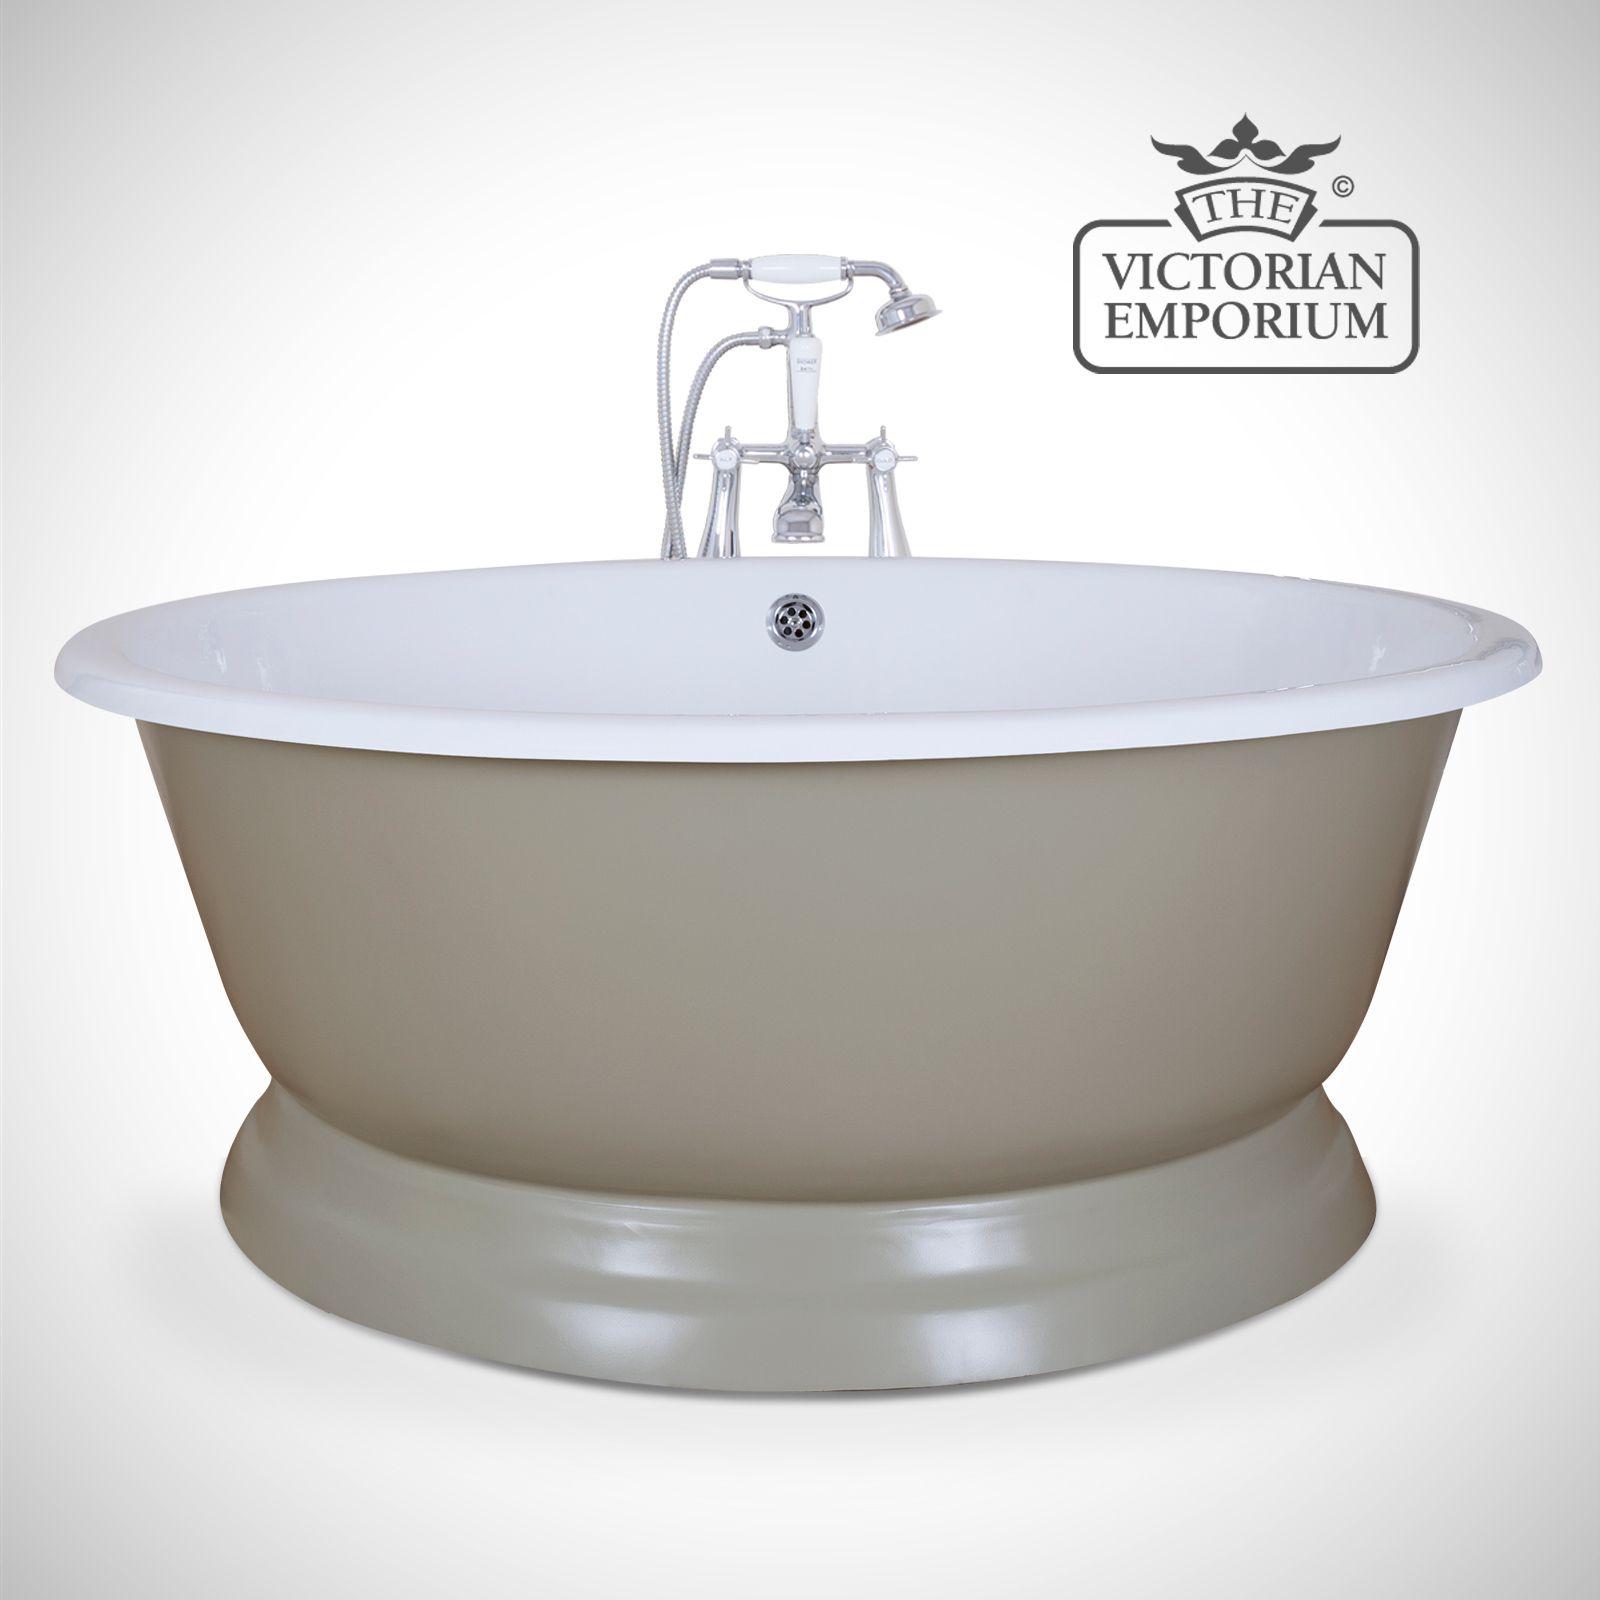 Circular cast iron bath - painted | Baths